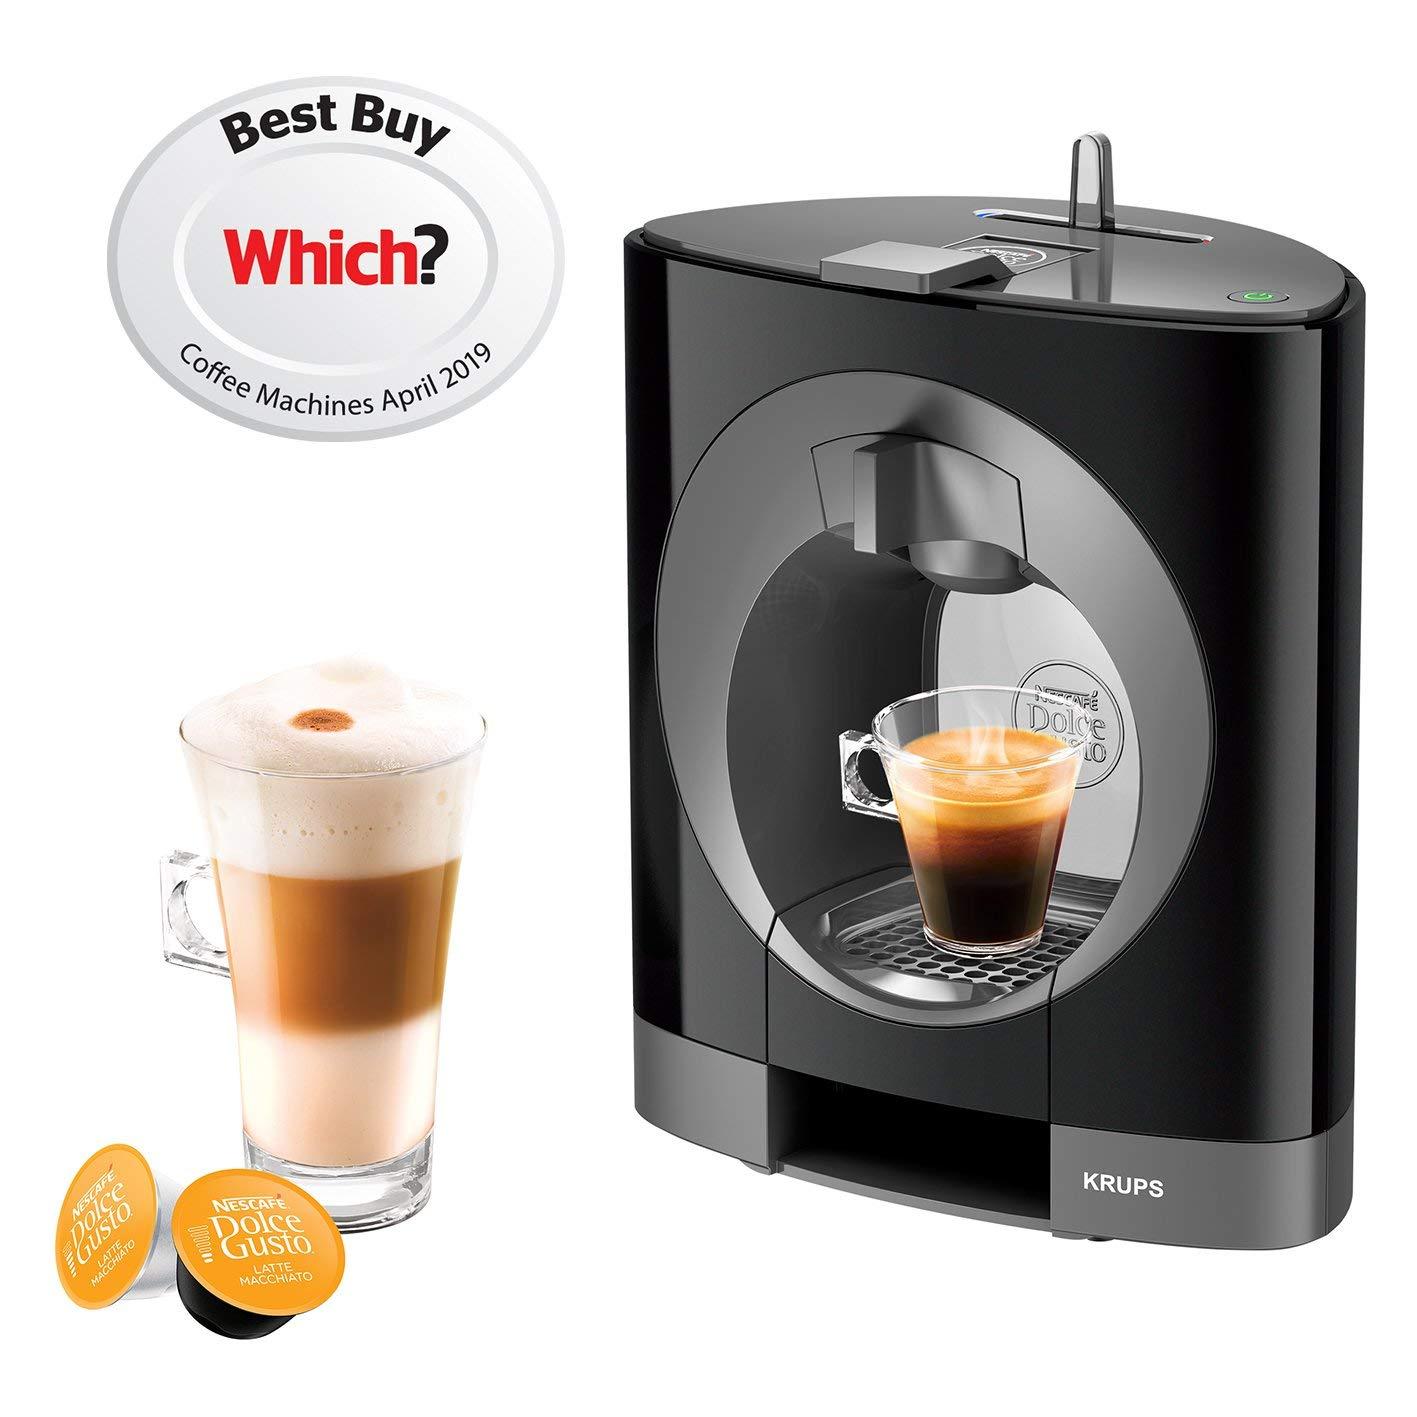 NESCAFE Dolce Gusto Oblo Coffee Machine by Krups - Black by Krups B00MHKYRXM